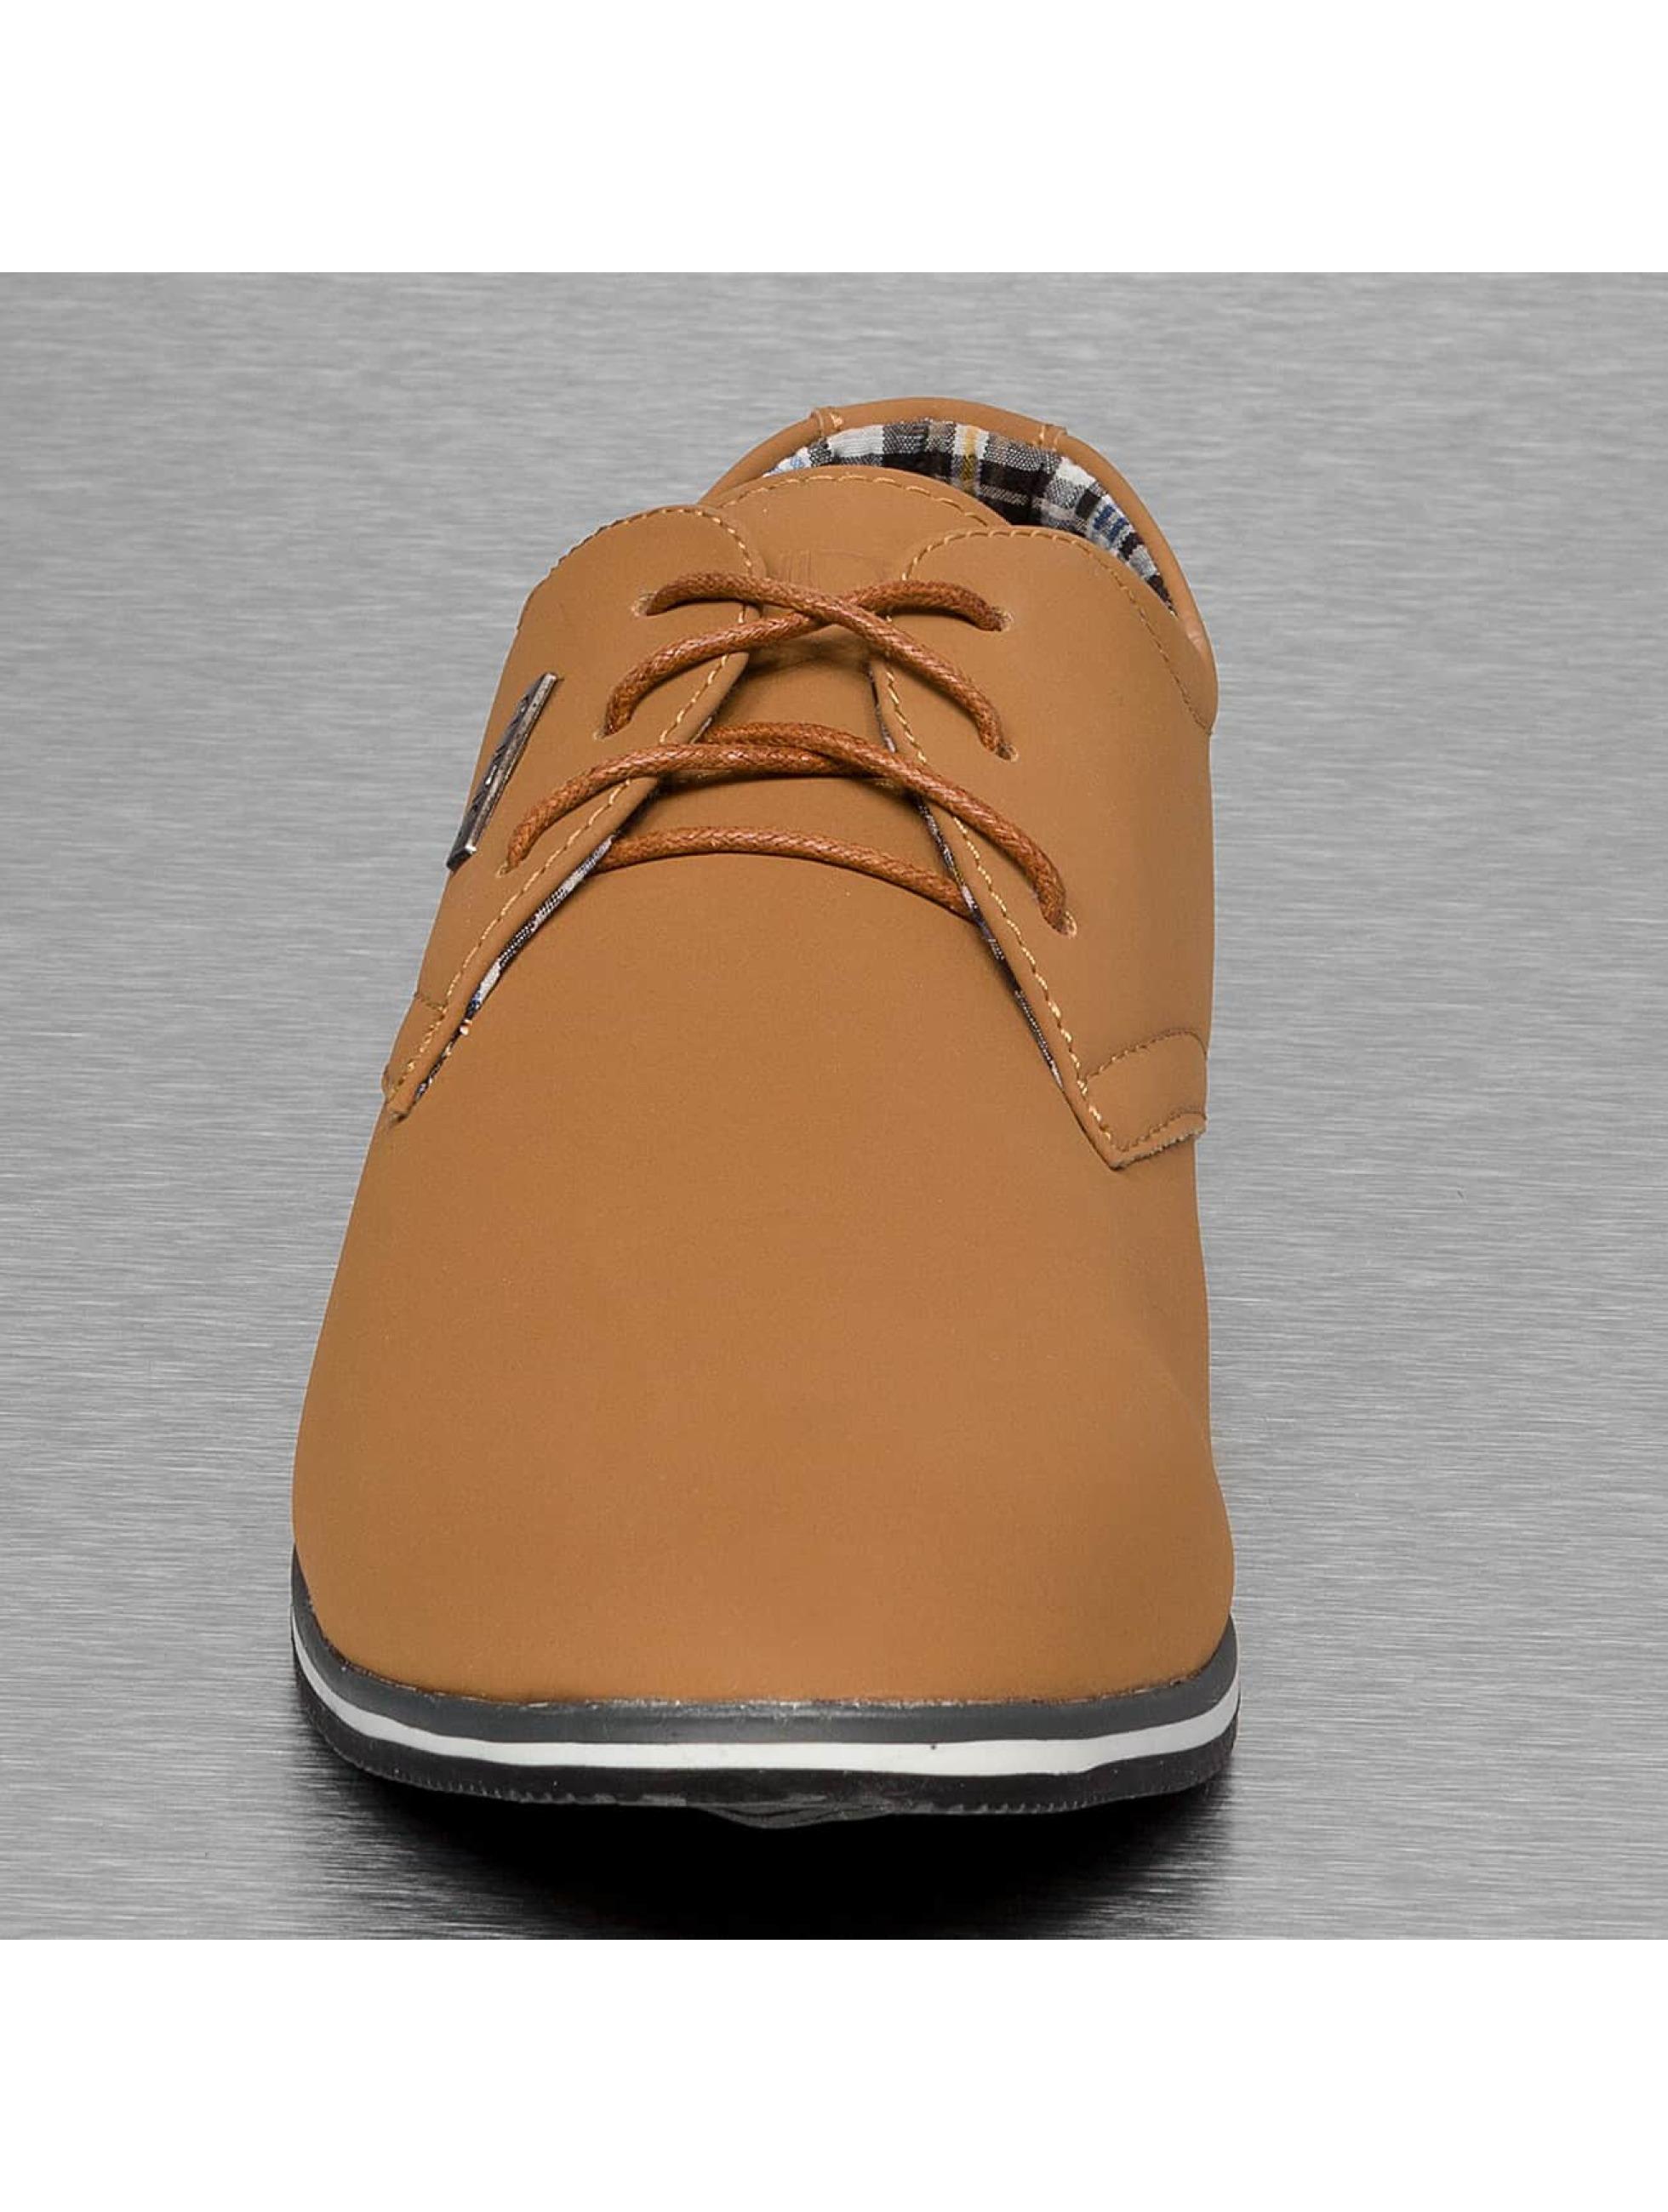 New York Style Sneakers Galway brown